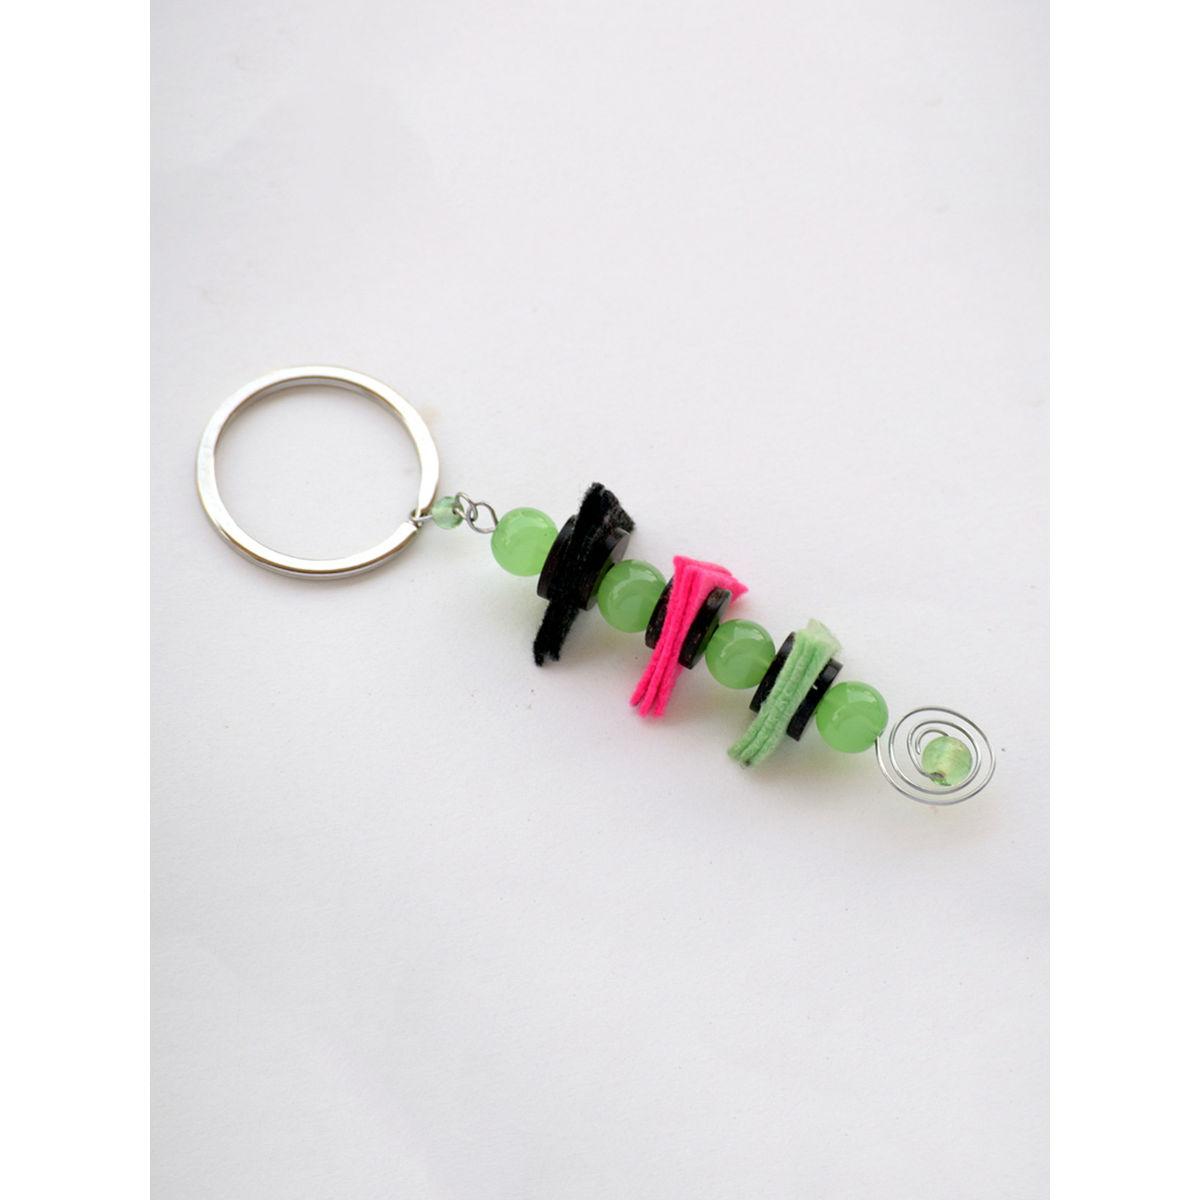 Balancing Act Keychain - Green